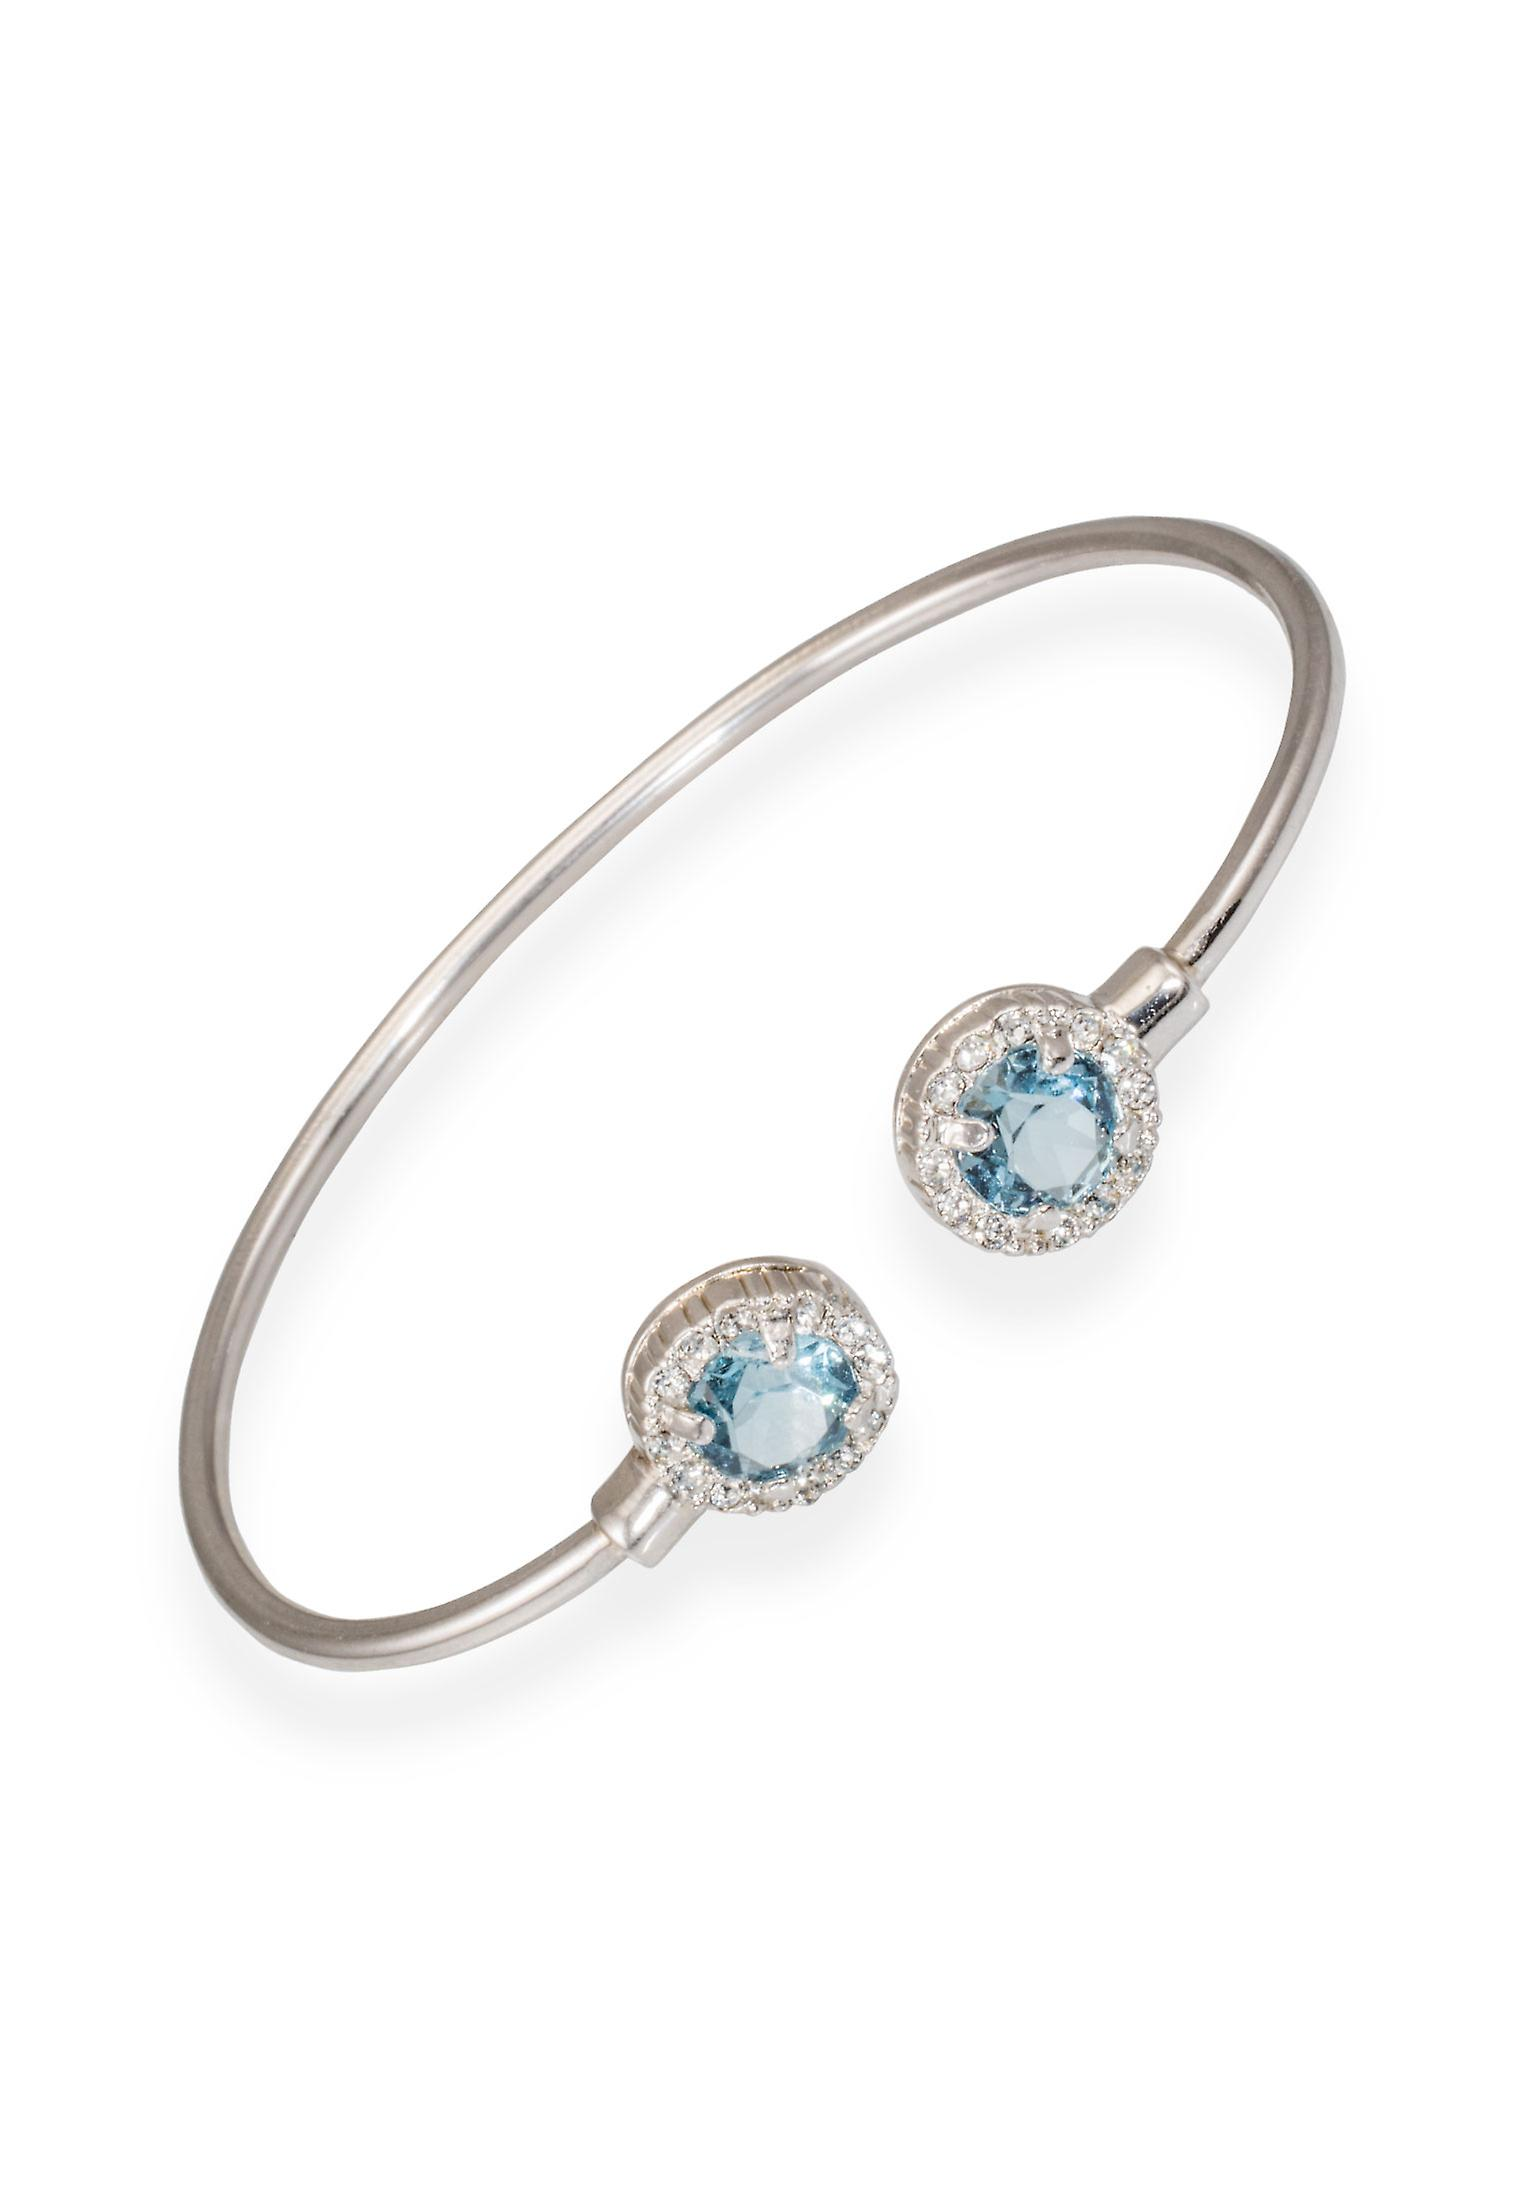 Blue bracelet with crystals from Swarovski 6327